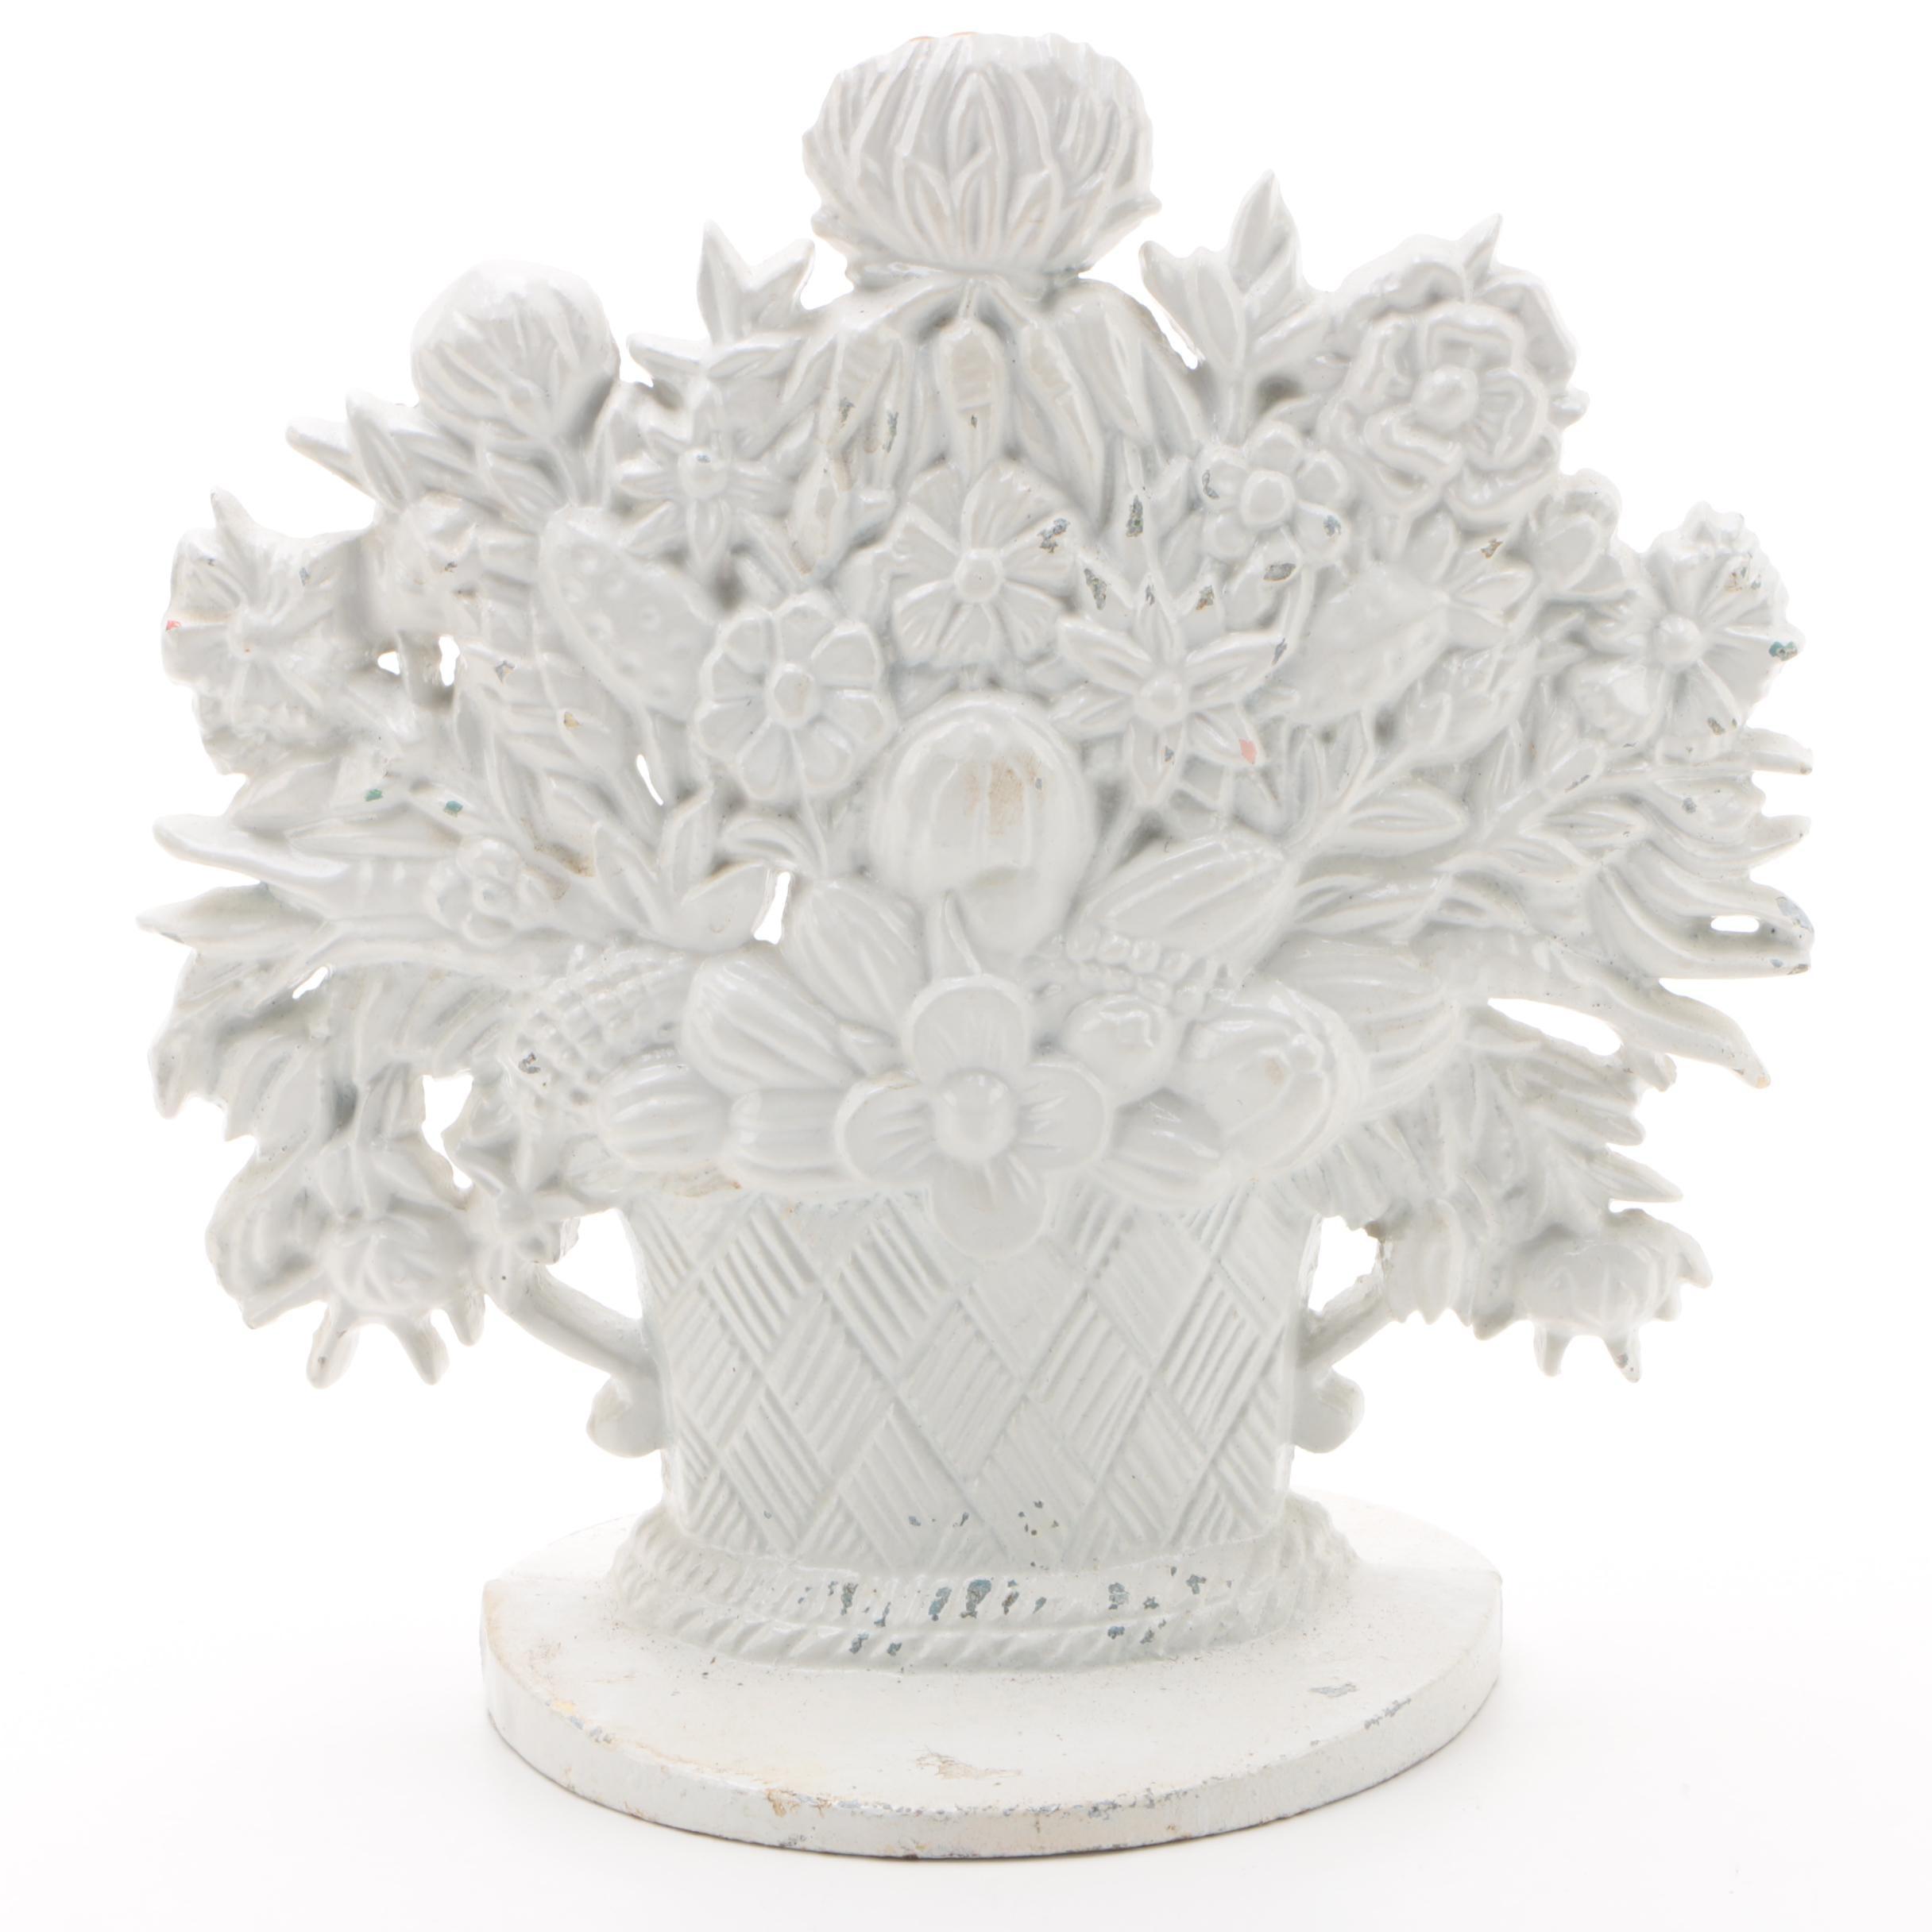 Midwest Importers White Cast Iron Floral Bouquet Doorstop